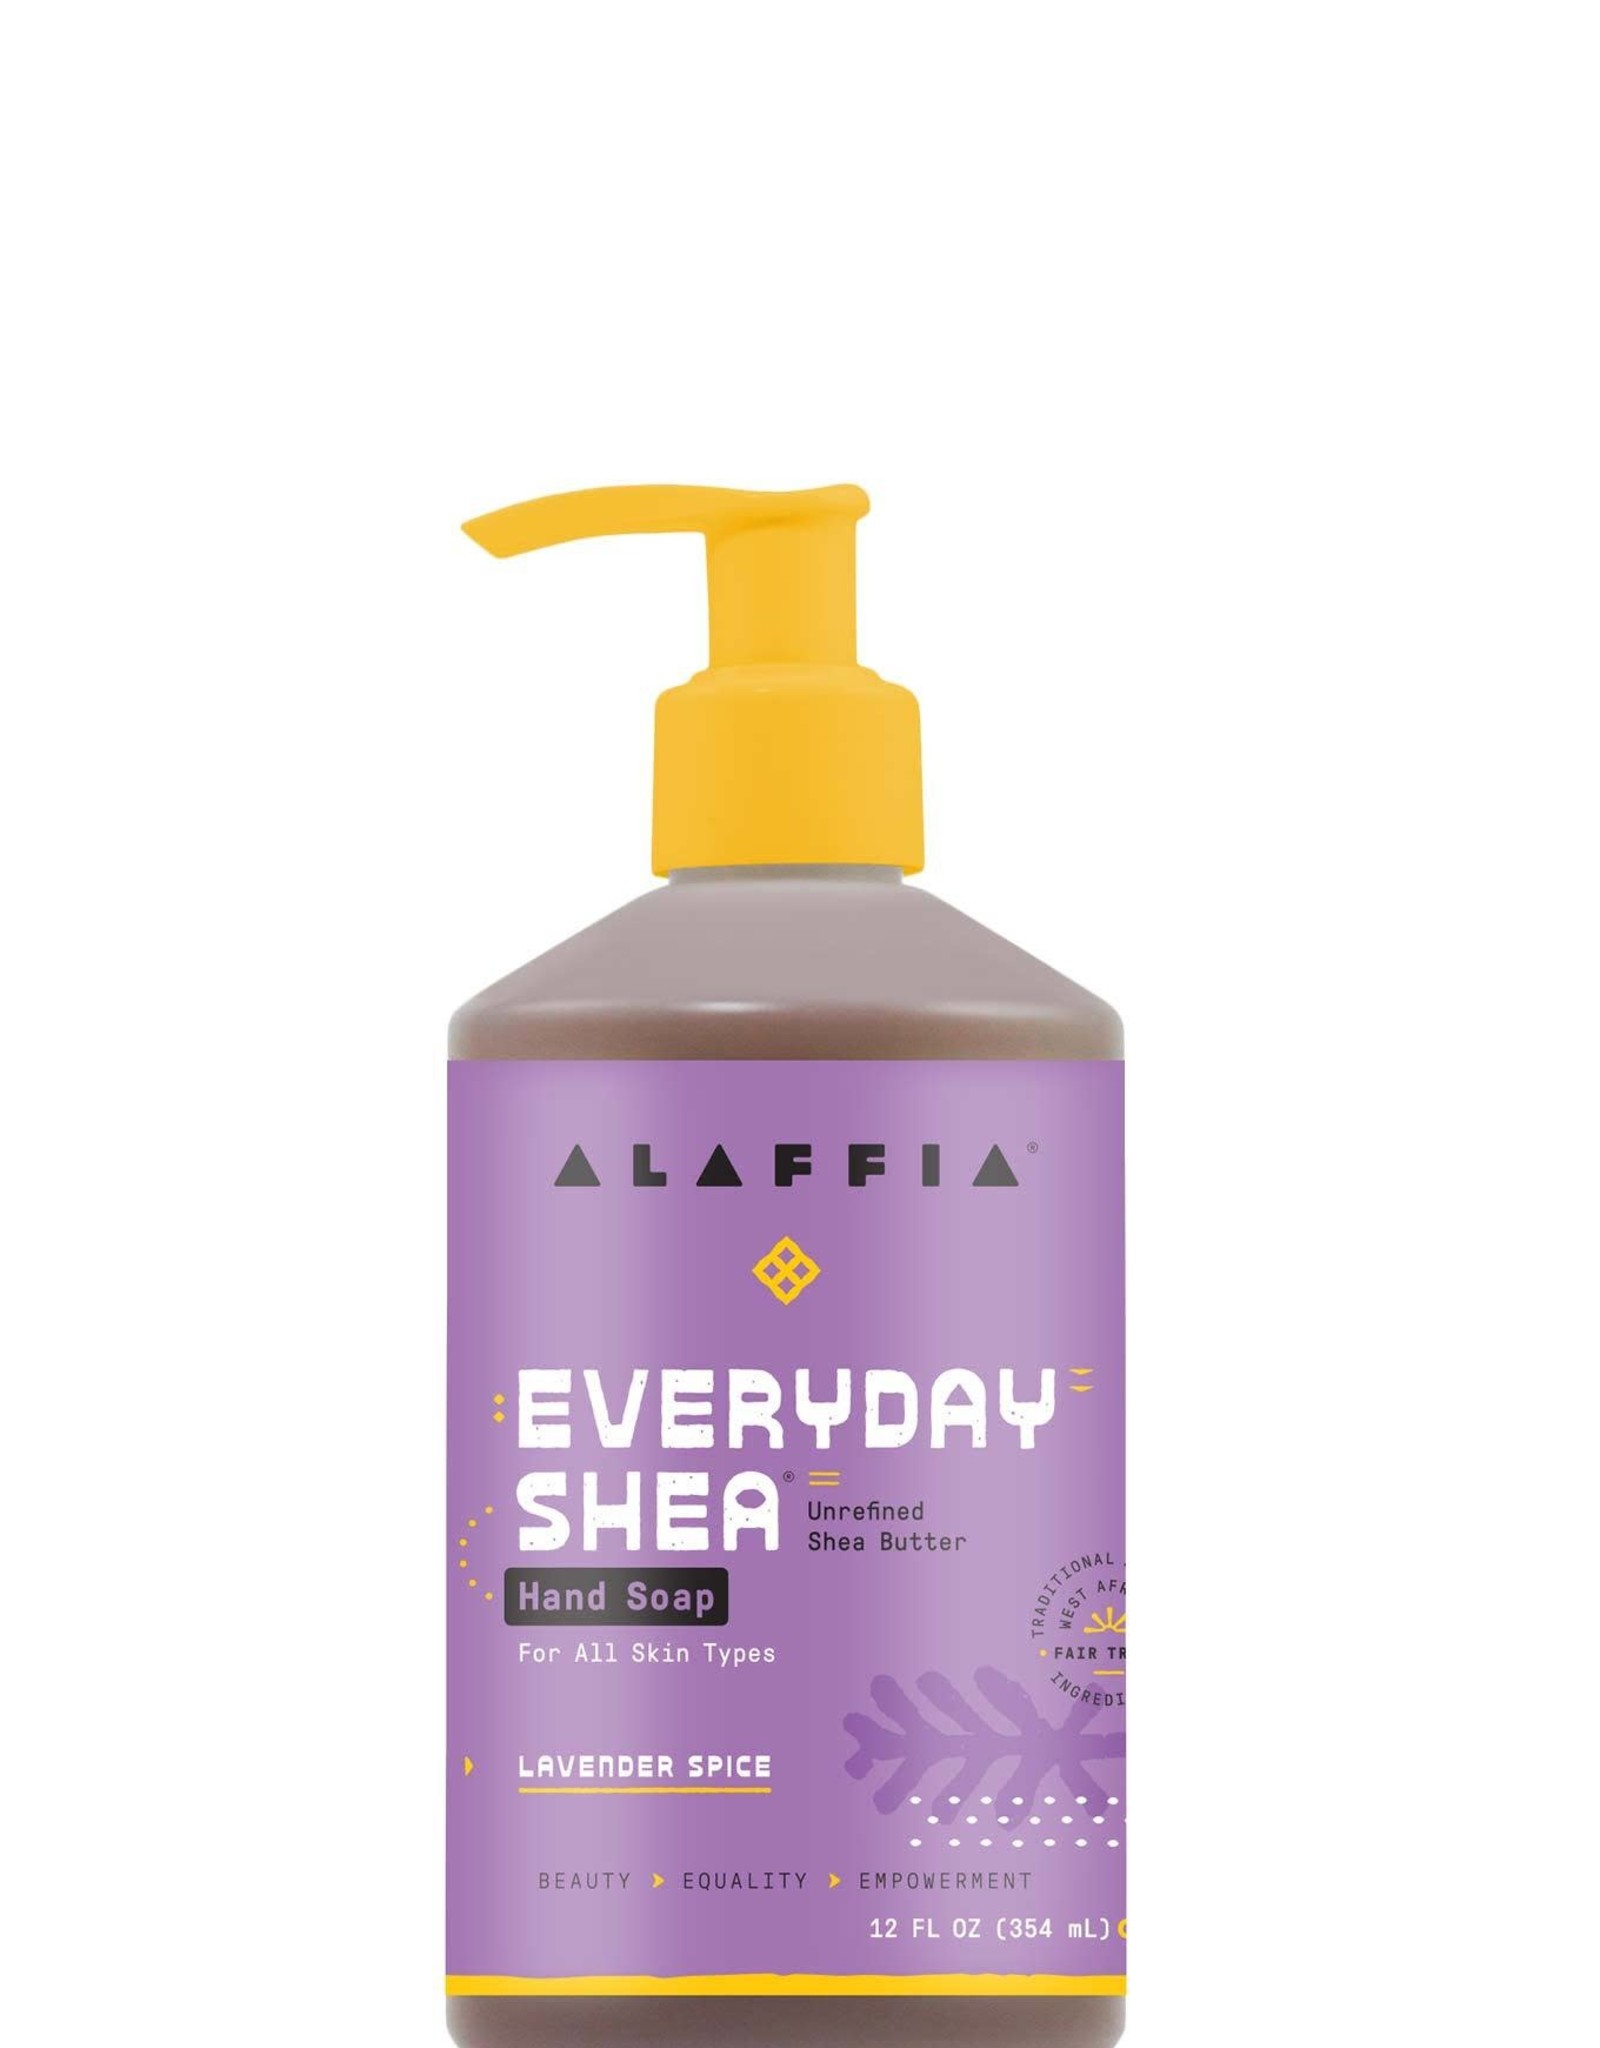 Alaffia EveryDay Shea Hand Soap Lavender Spice